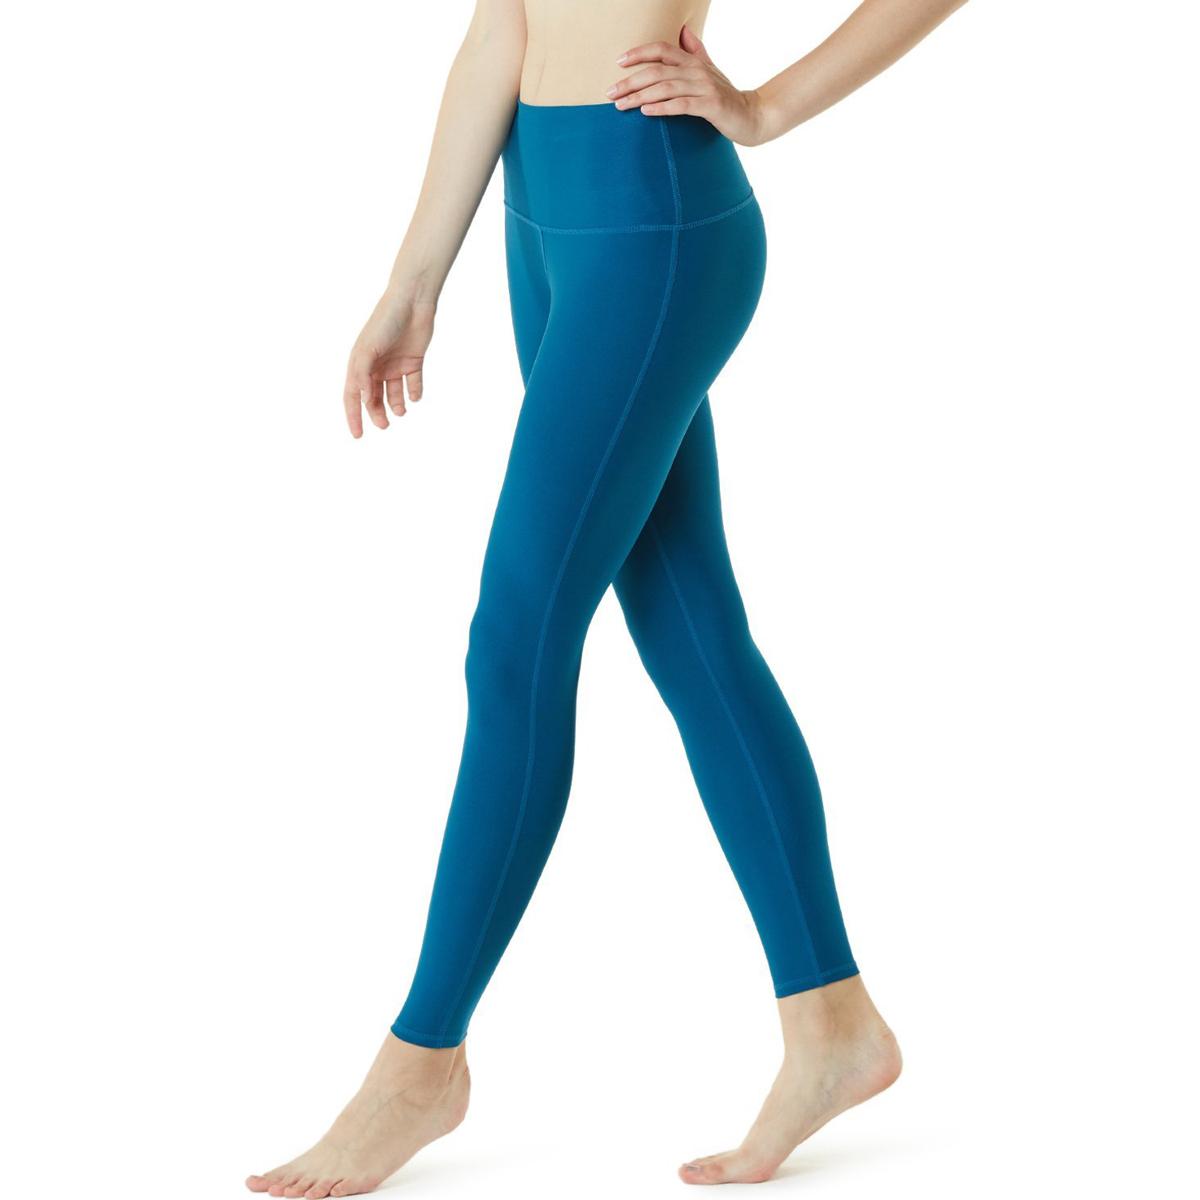 thumbnail 36 - TSLA Tesla FYP42 Women's High-Waisted Ultra-Stretch Tummy Control Yoga Pants